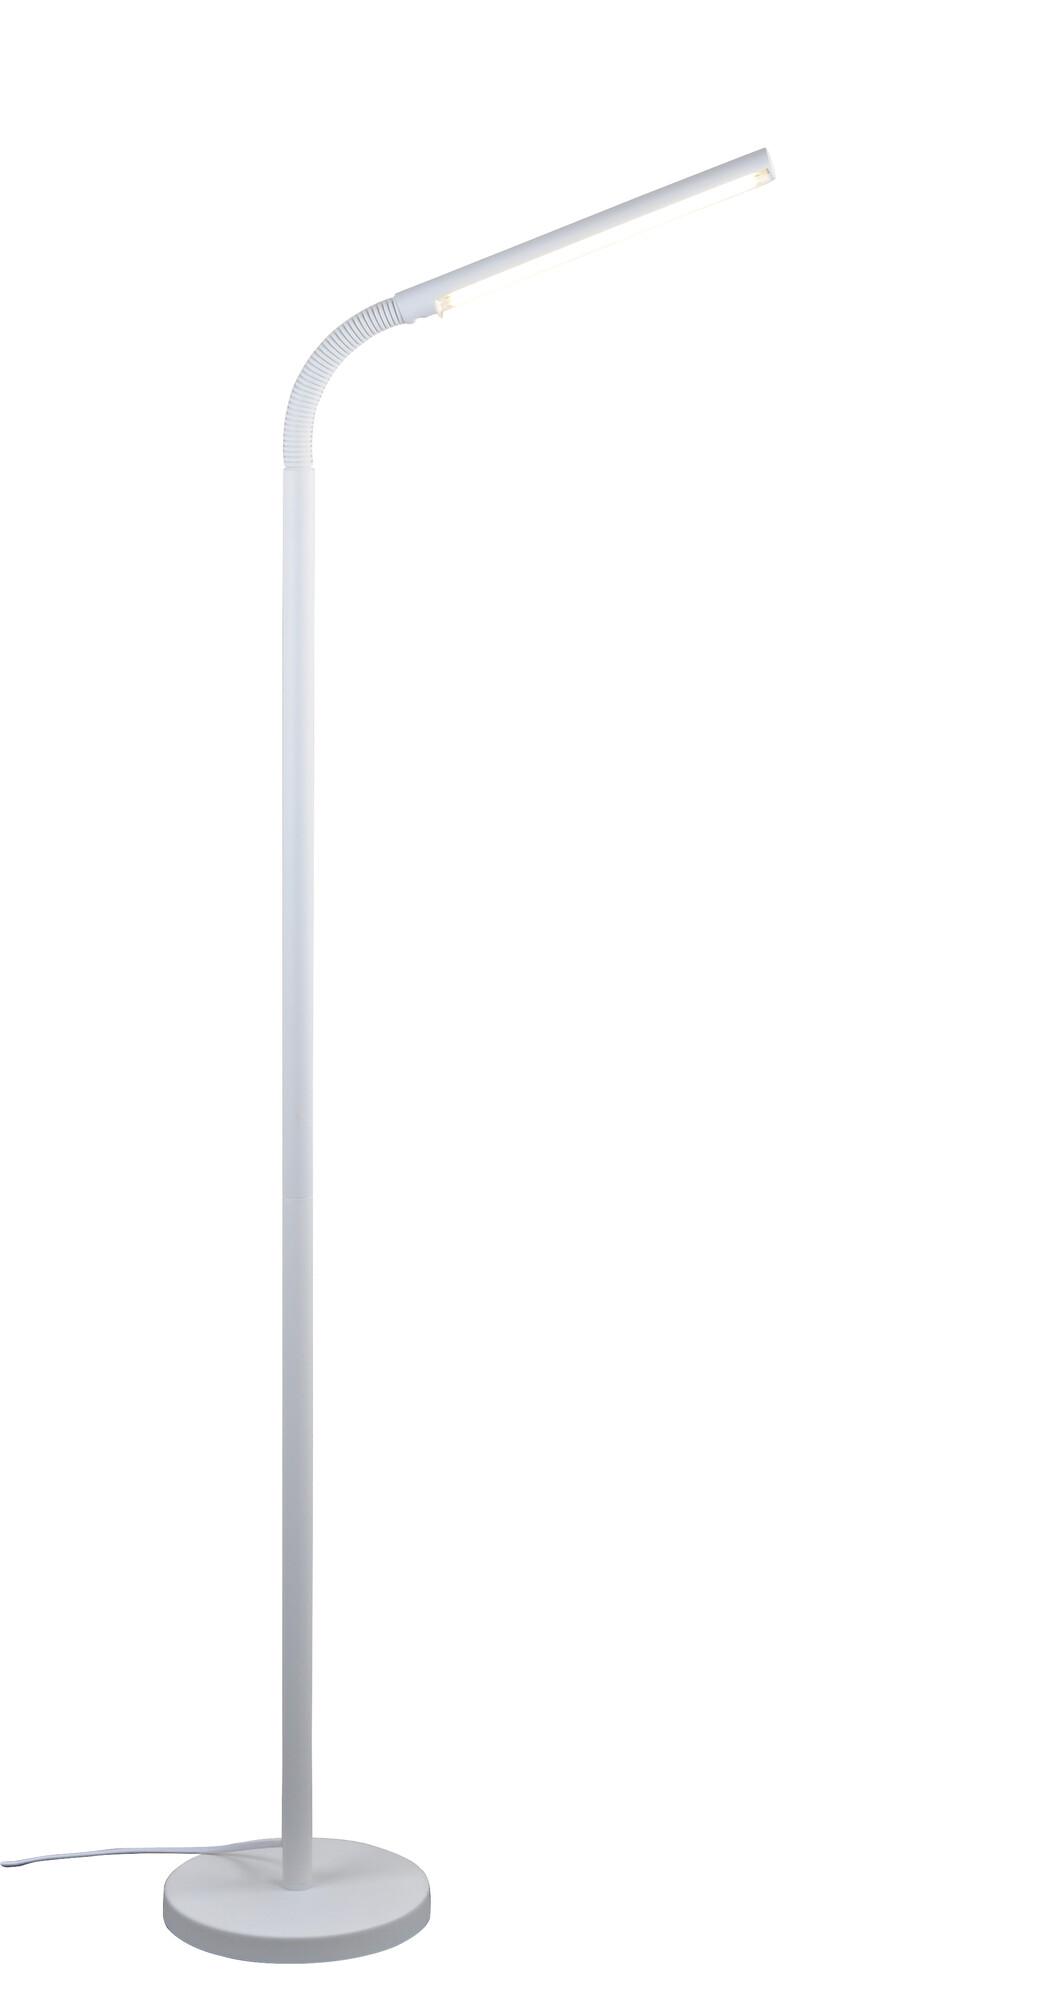 FLEXI Lampadaire LED 1x8W/610lm Blanc